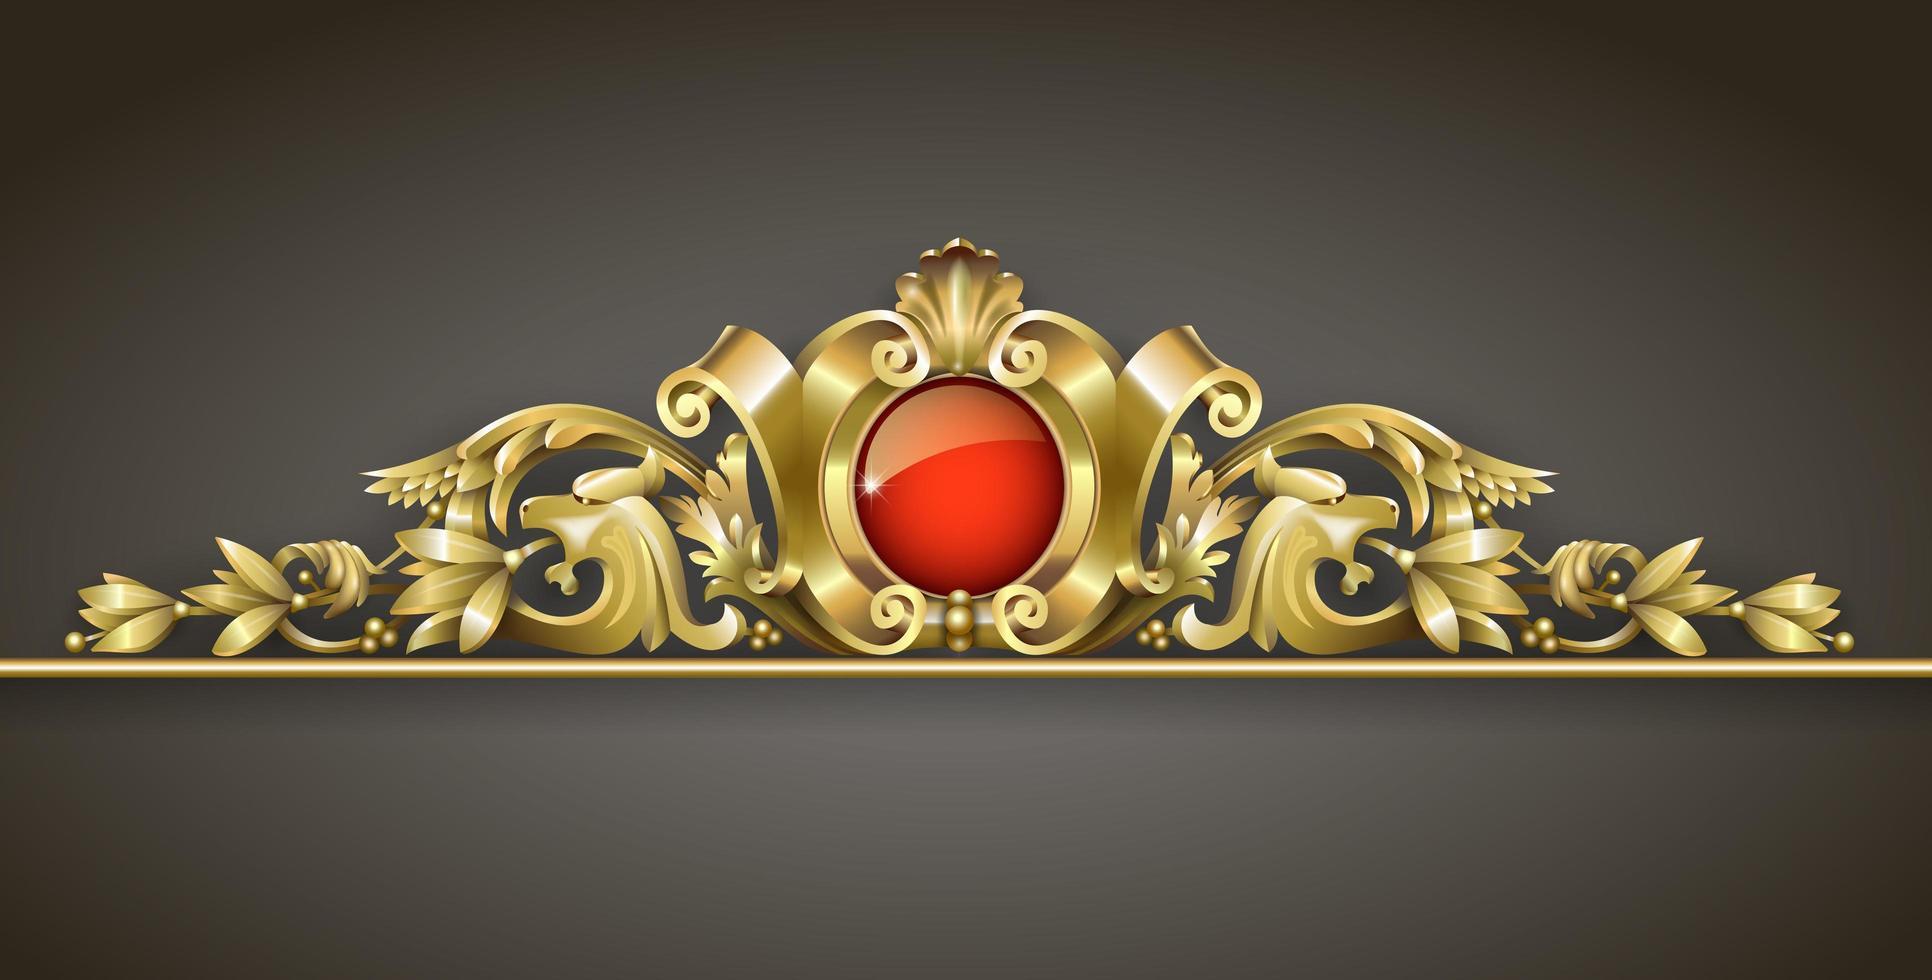 klassisk guldprydnad med röd juvel vektor